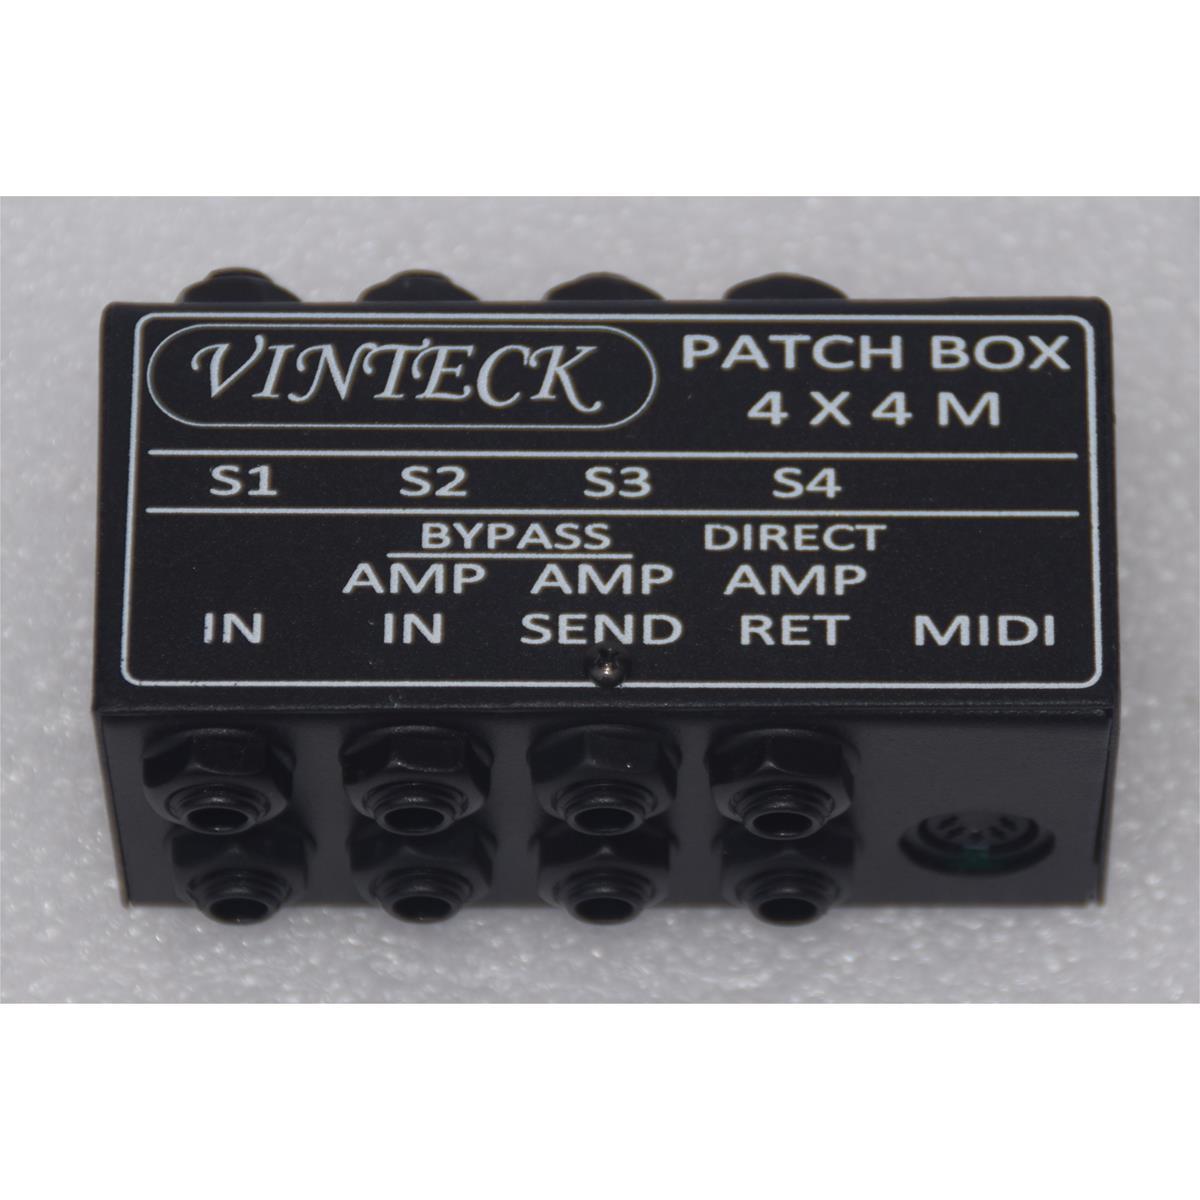 VINTECK 4X4M PATCH BOX